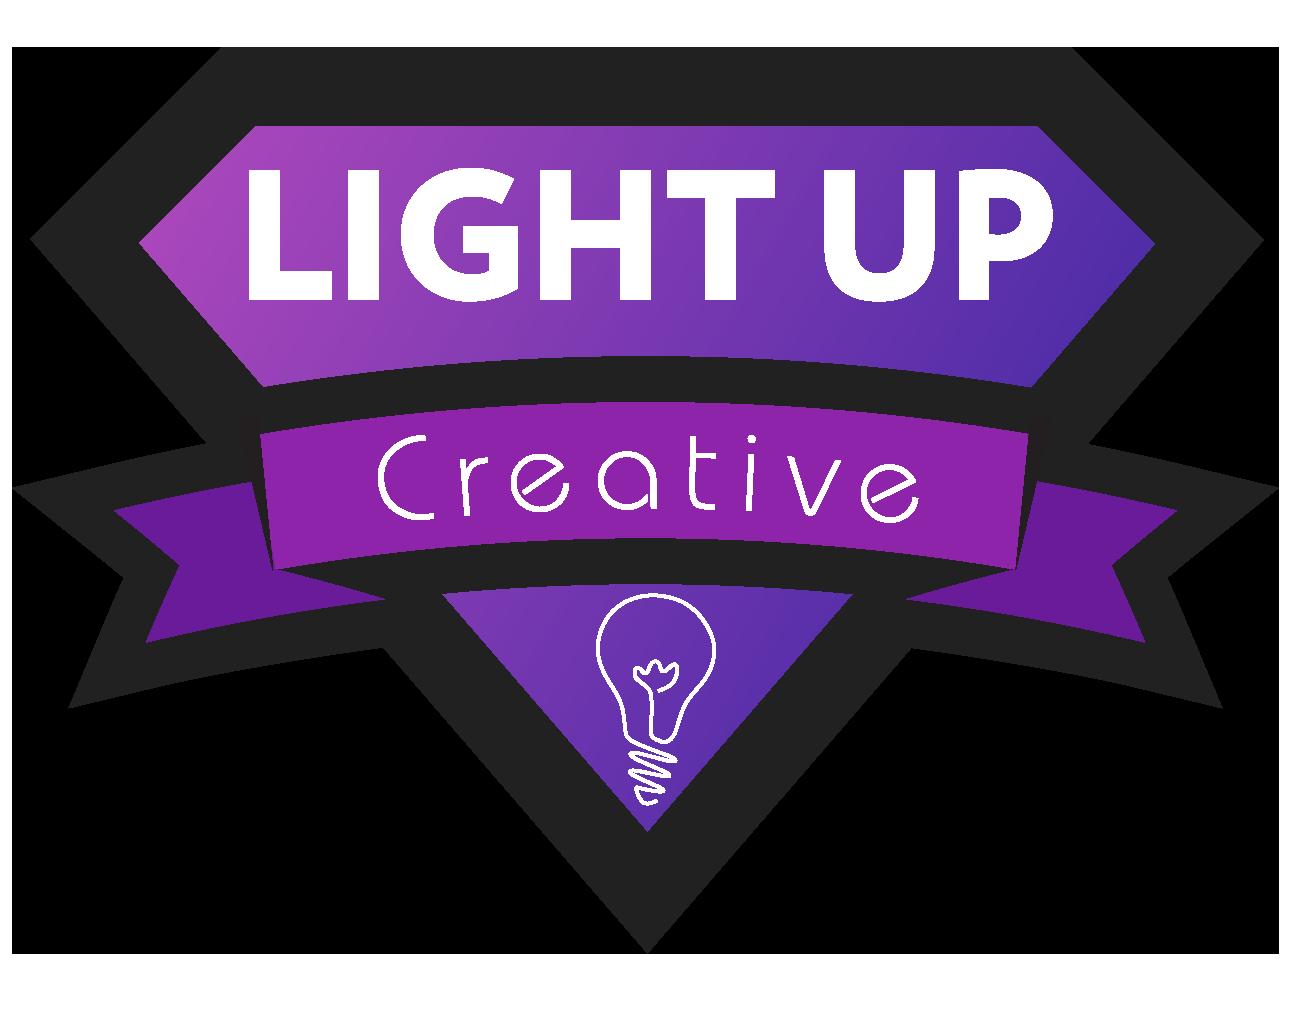 Light Up Creative Ltd